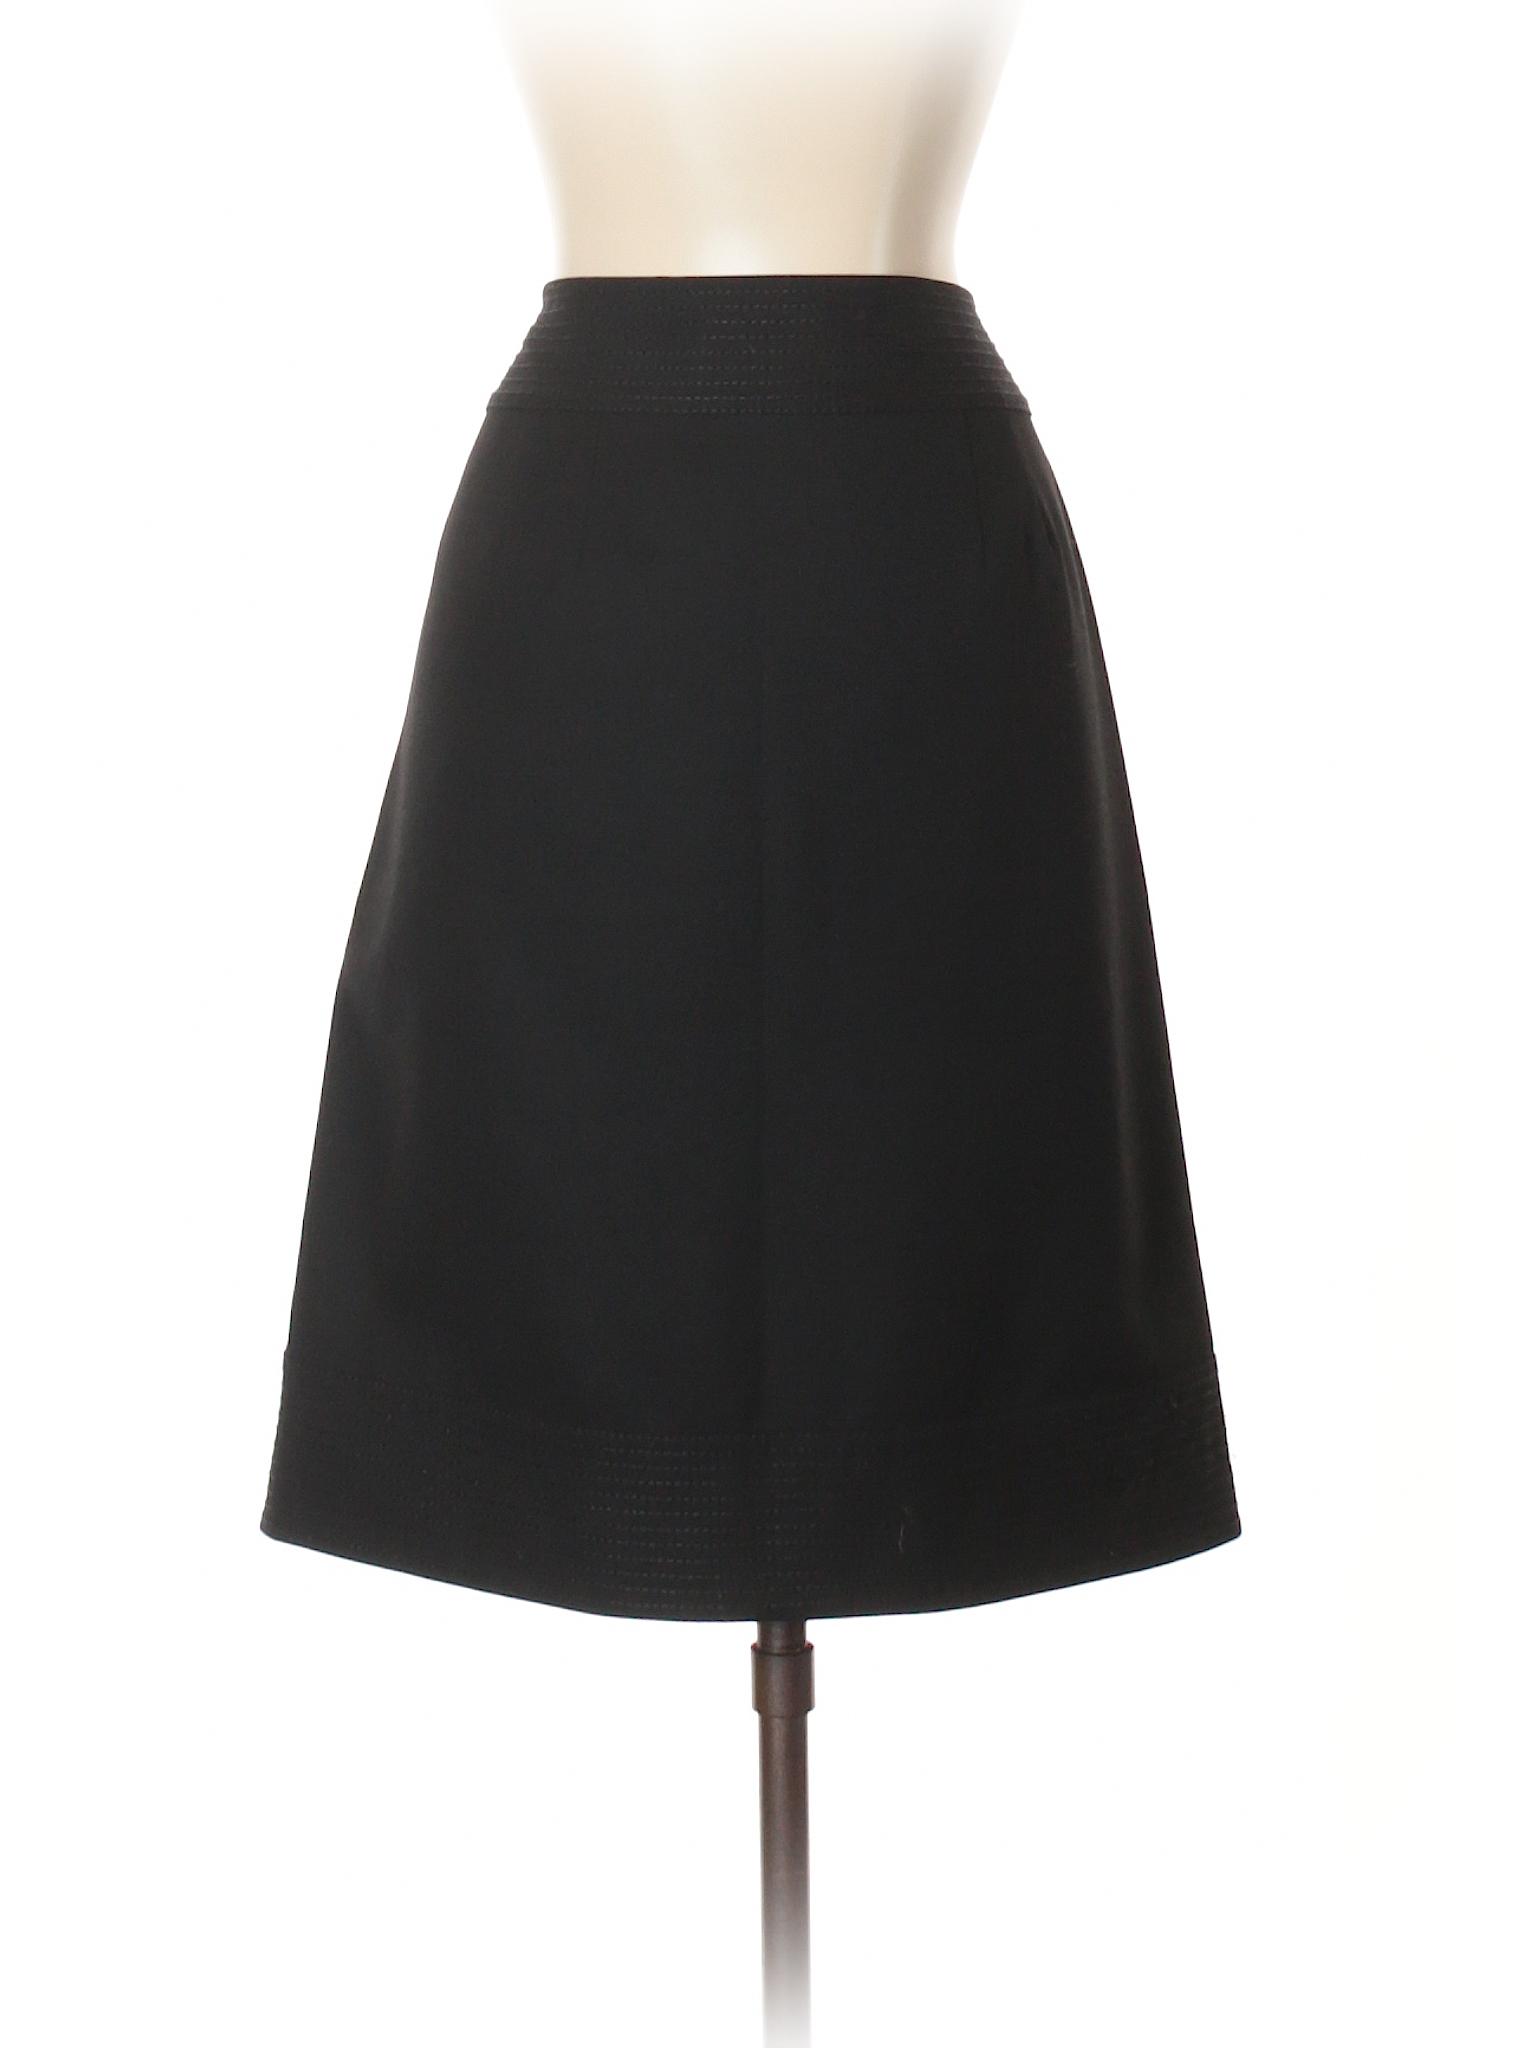 Skirt Casual Boutique Casual Boutique wtFE8E